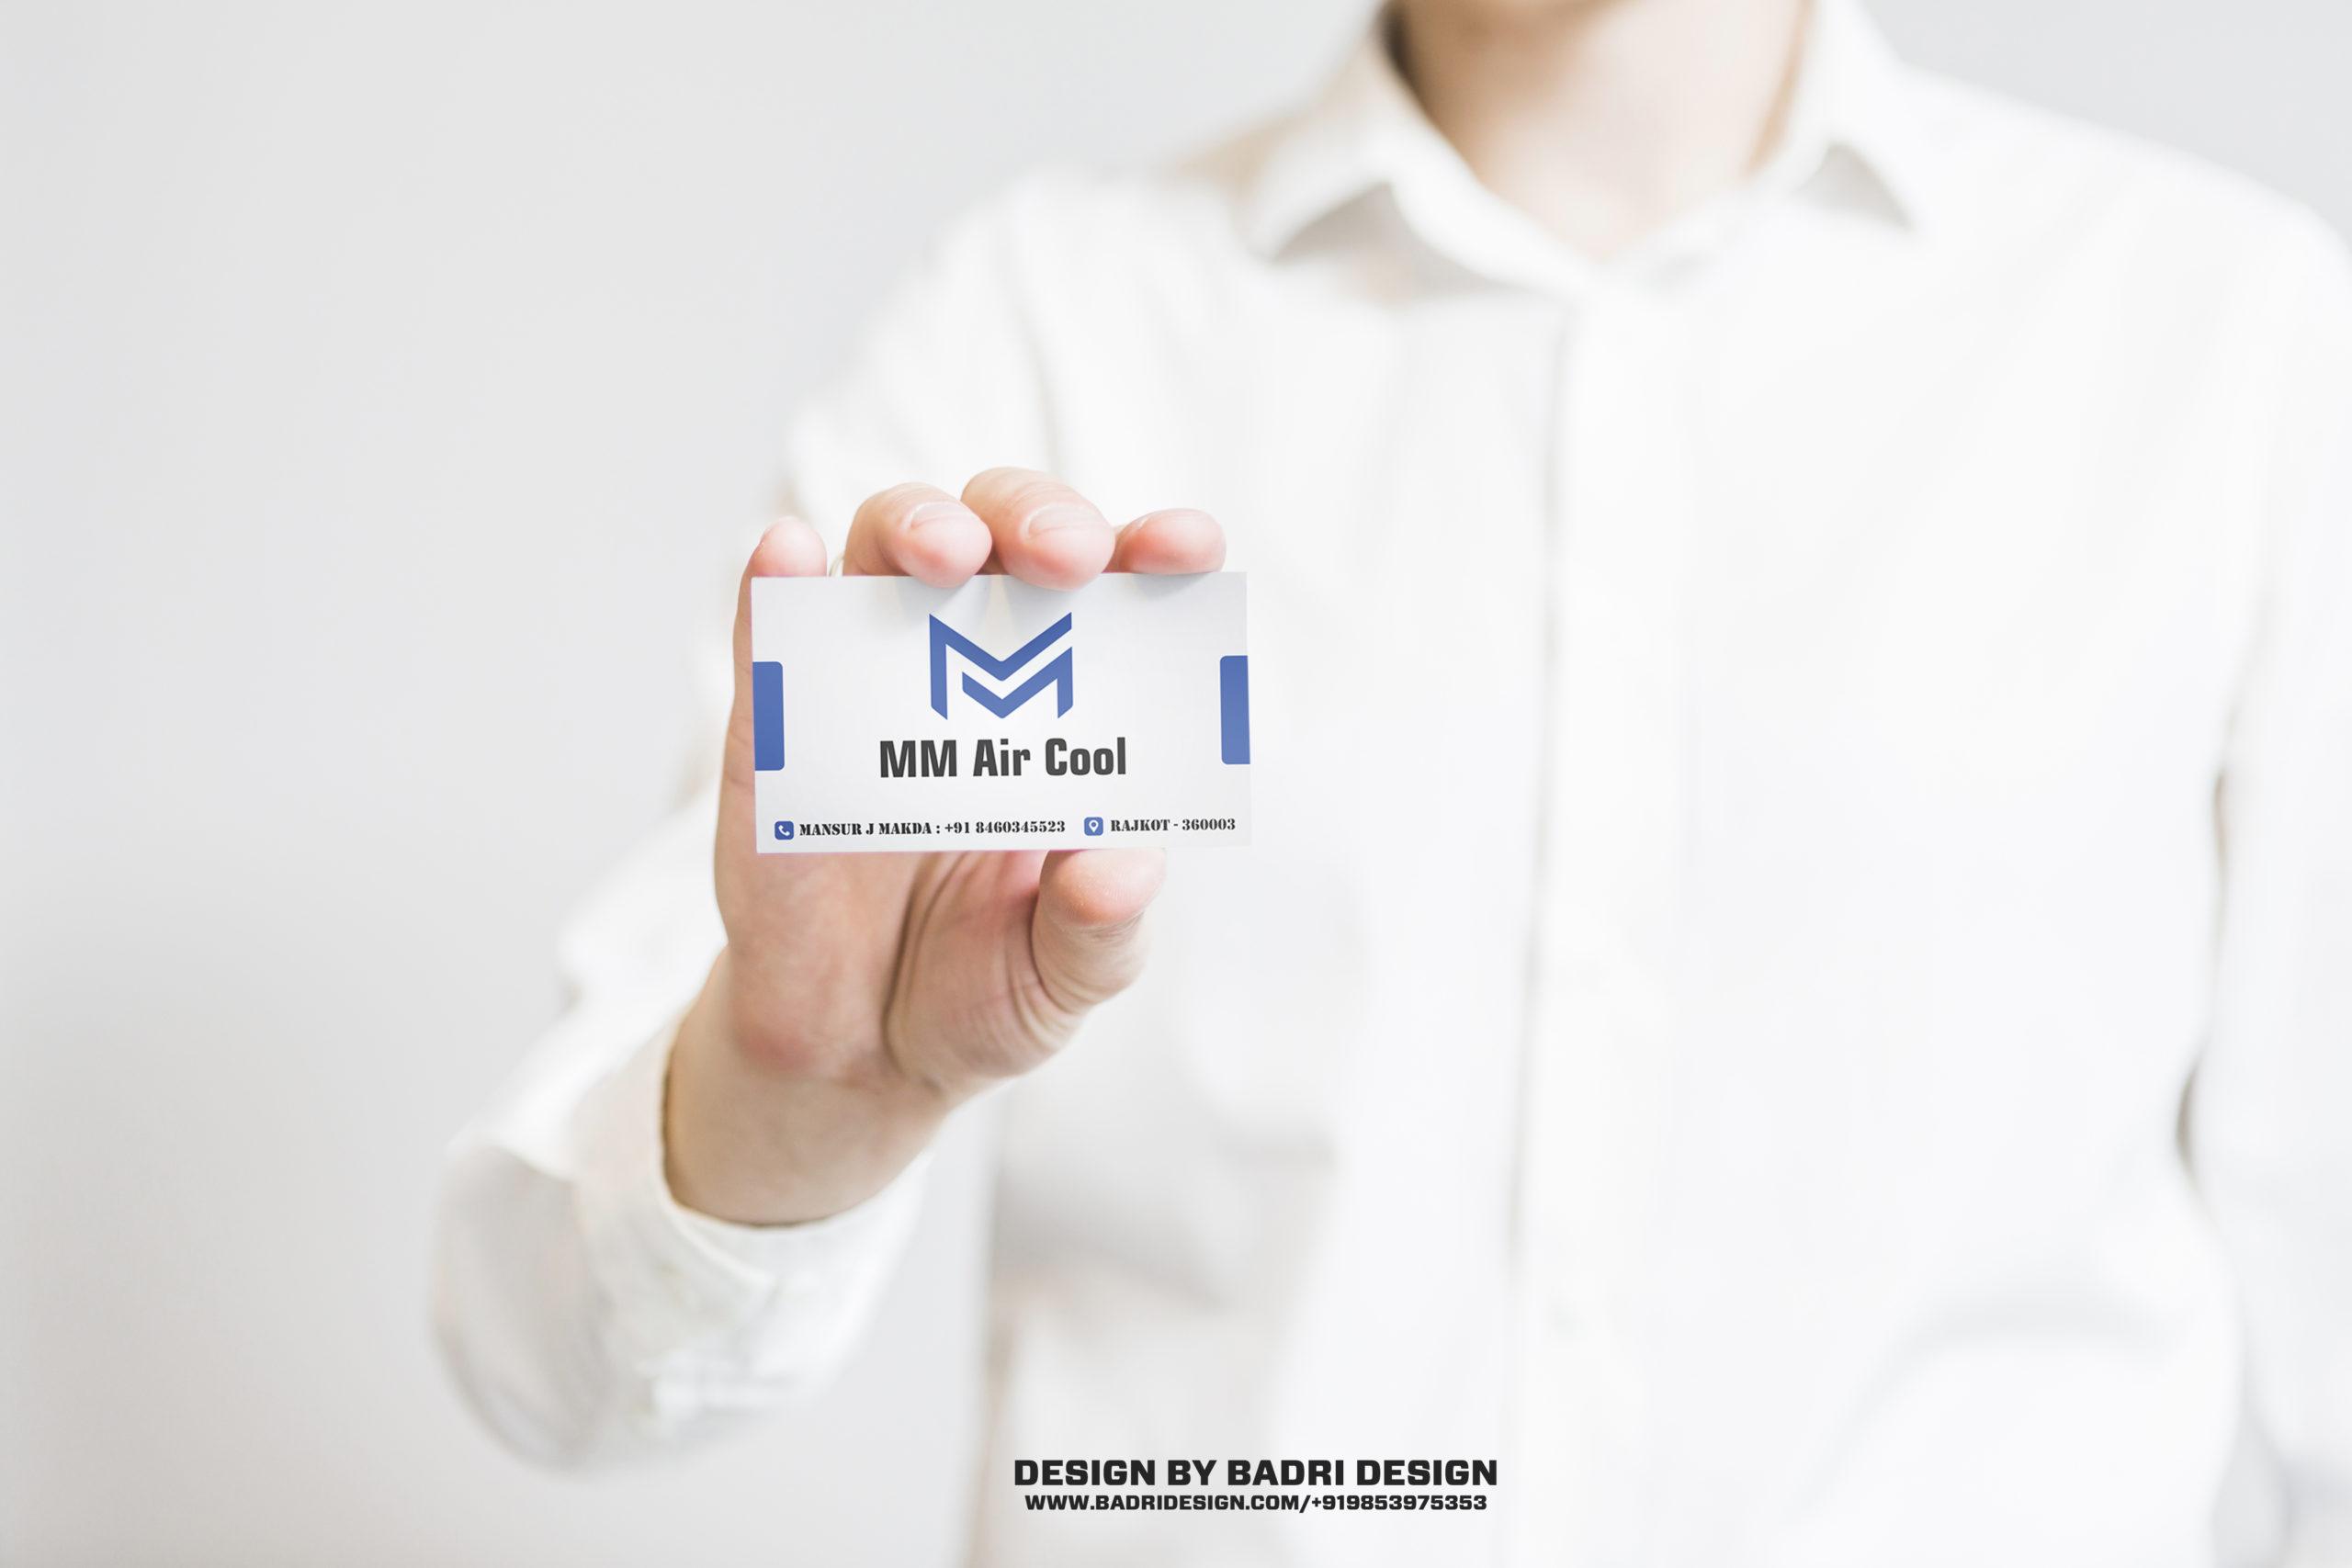 AC services repair company business card design by Badri Design